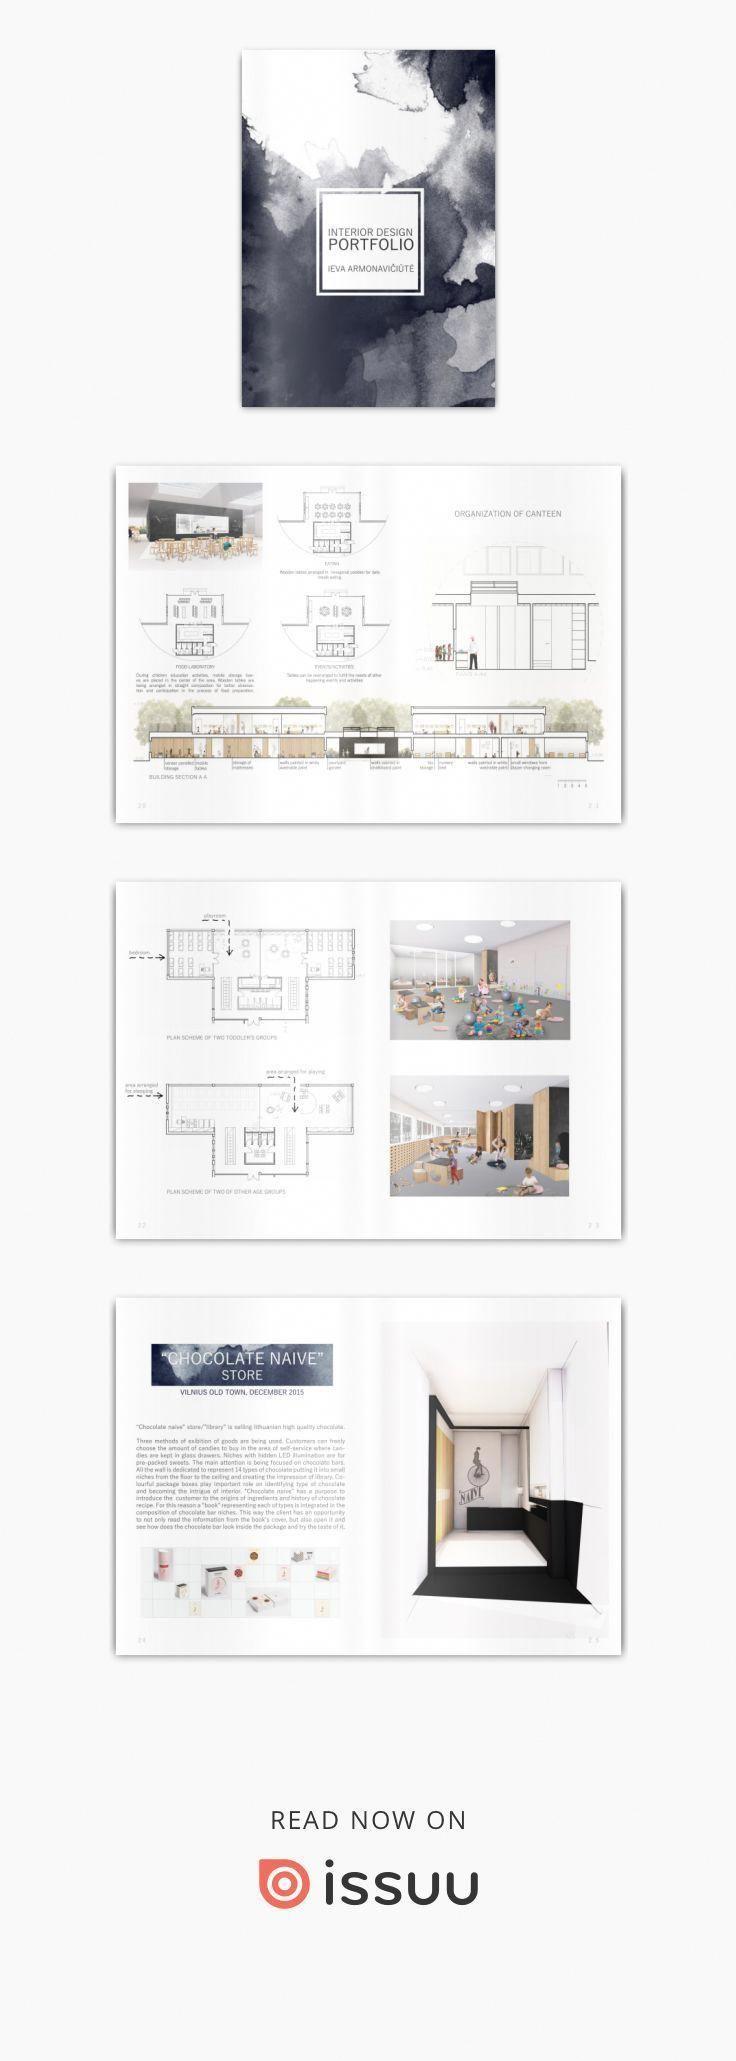 Bmw 3 Interior Isinteriordesigninhighdemand Interiorresourcesdallas 건축 레이아웃 건축 디자인 디자인 이력서